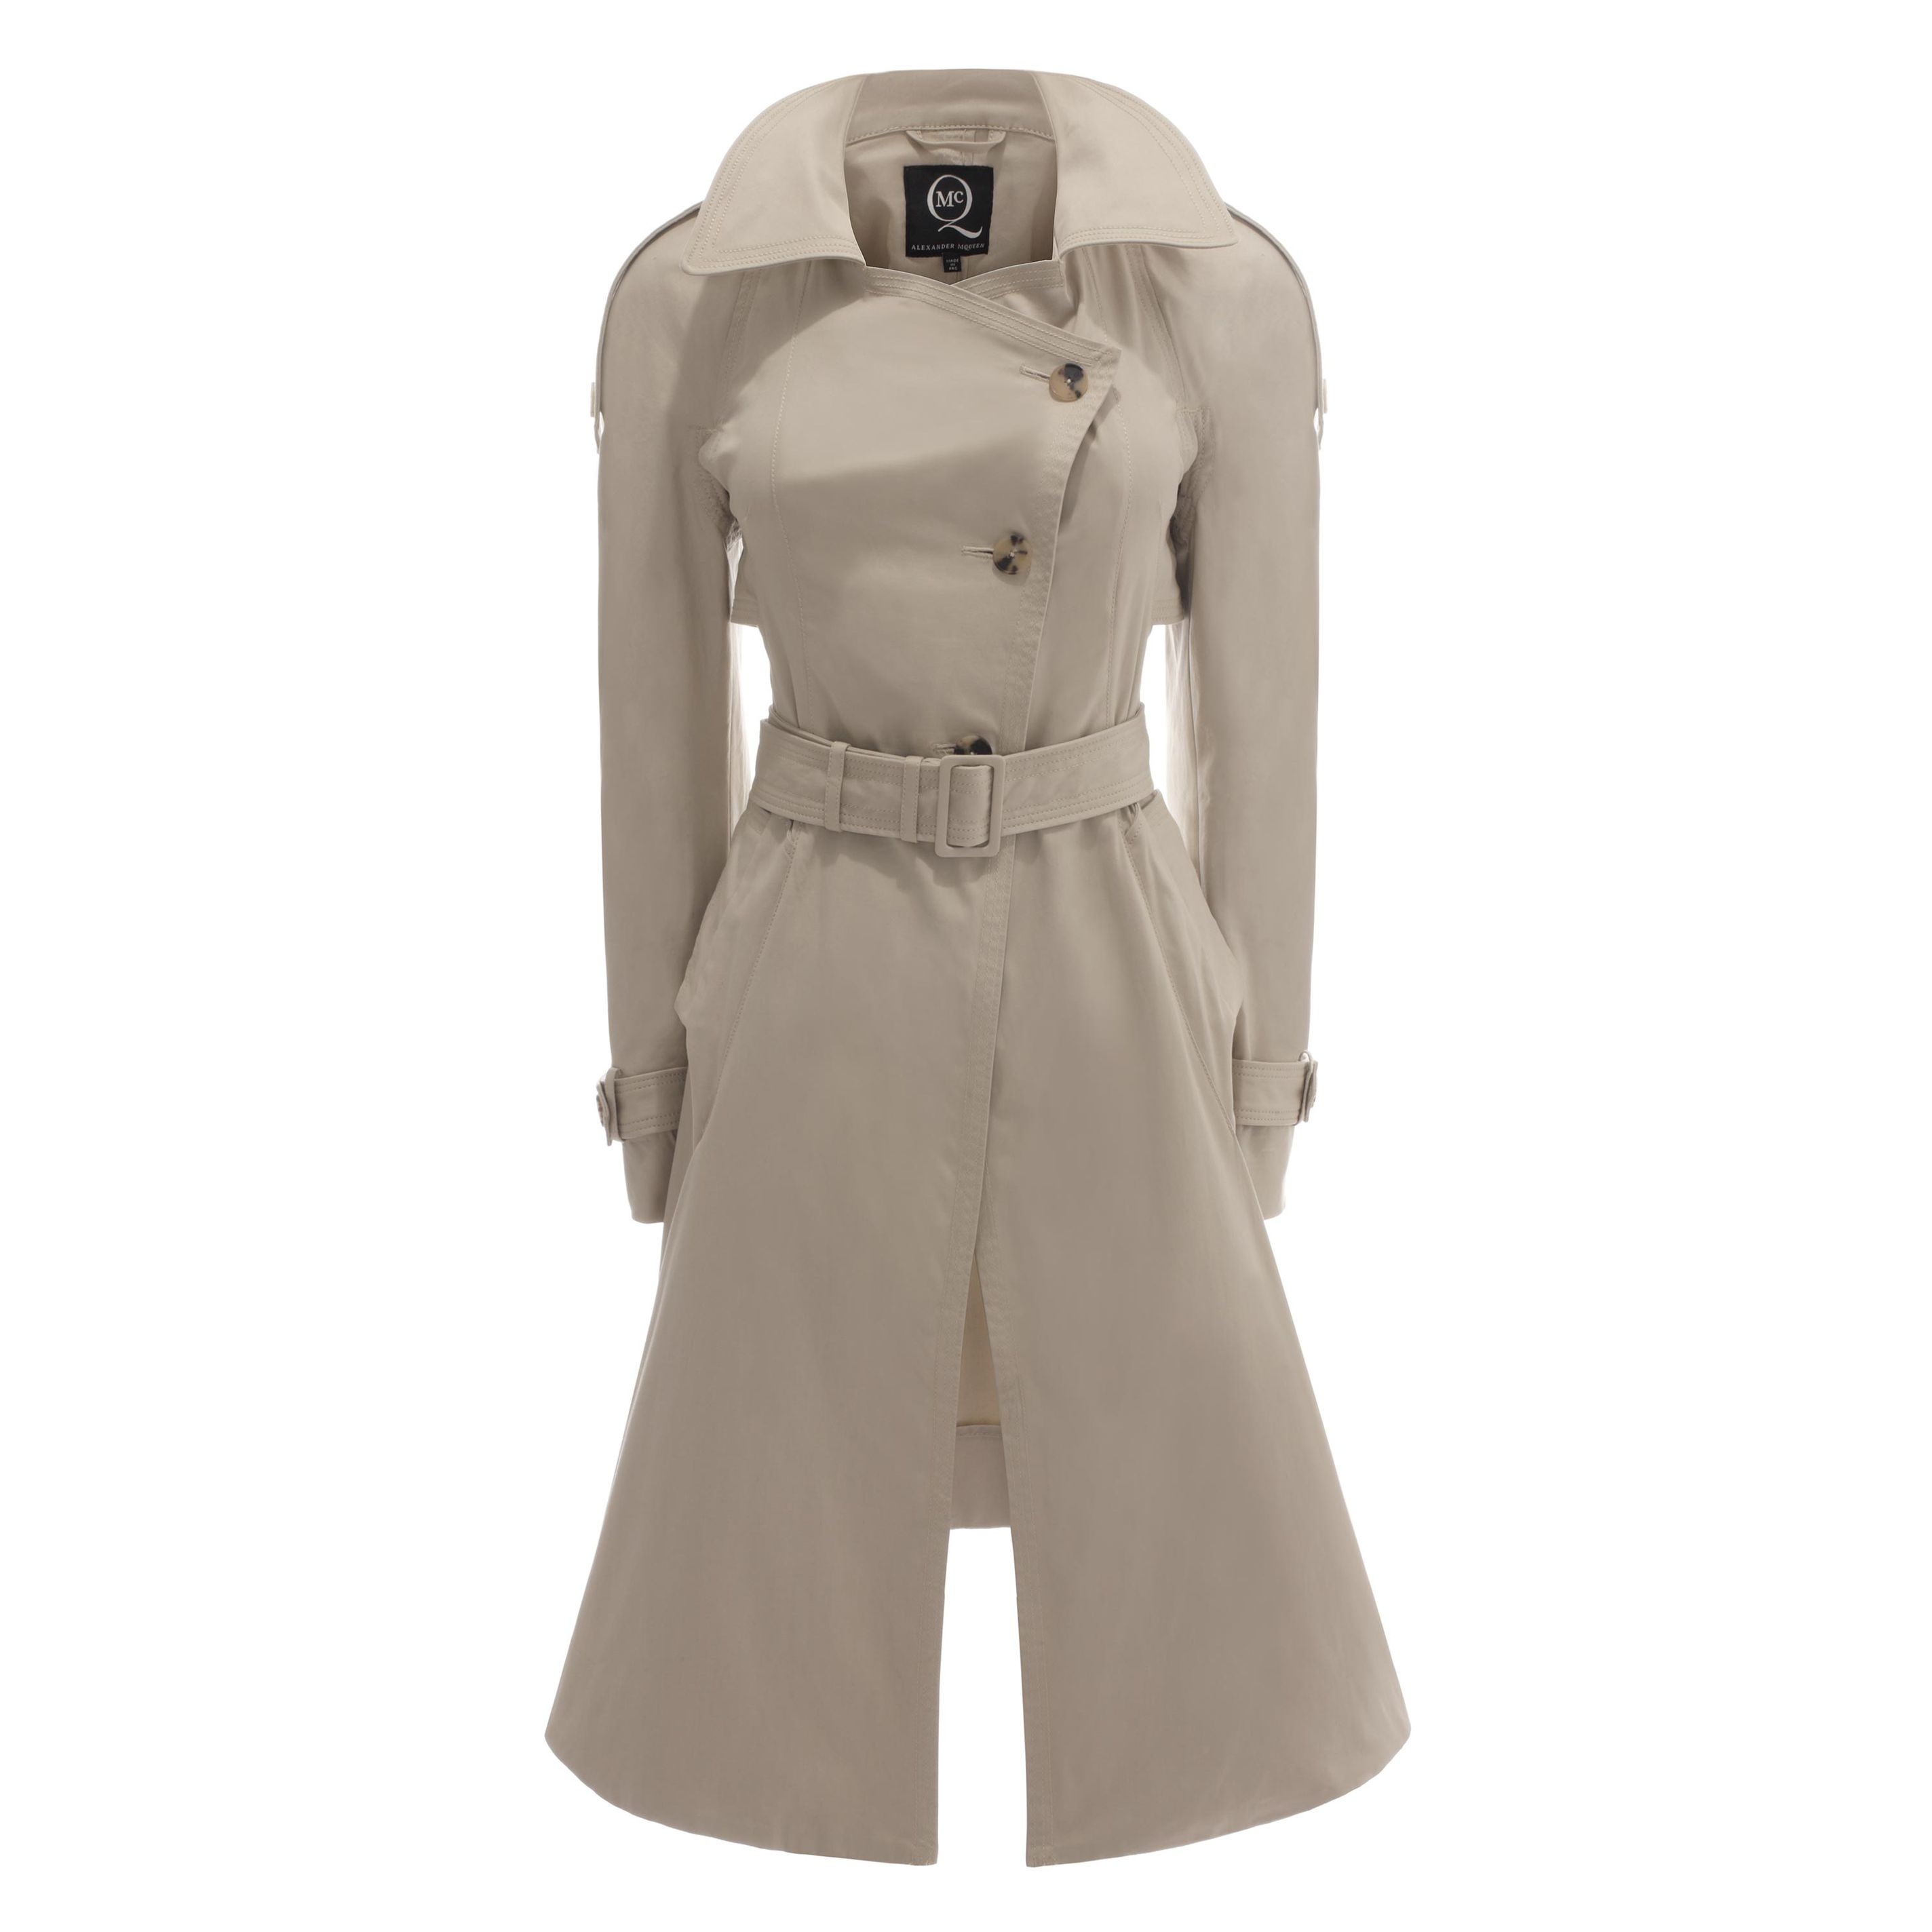 Asymmetric Trench Coat McQ | Coat | Ready To Wear